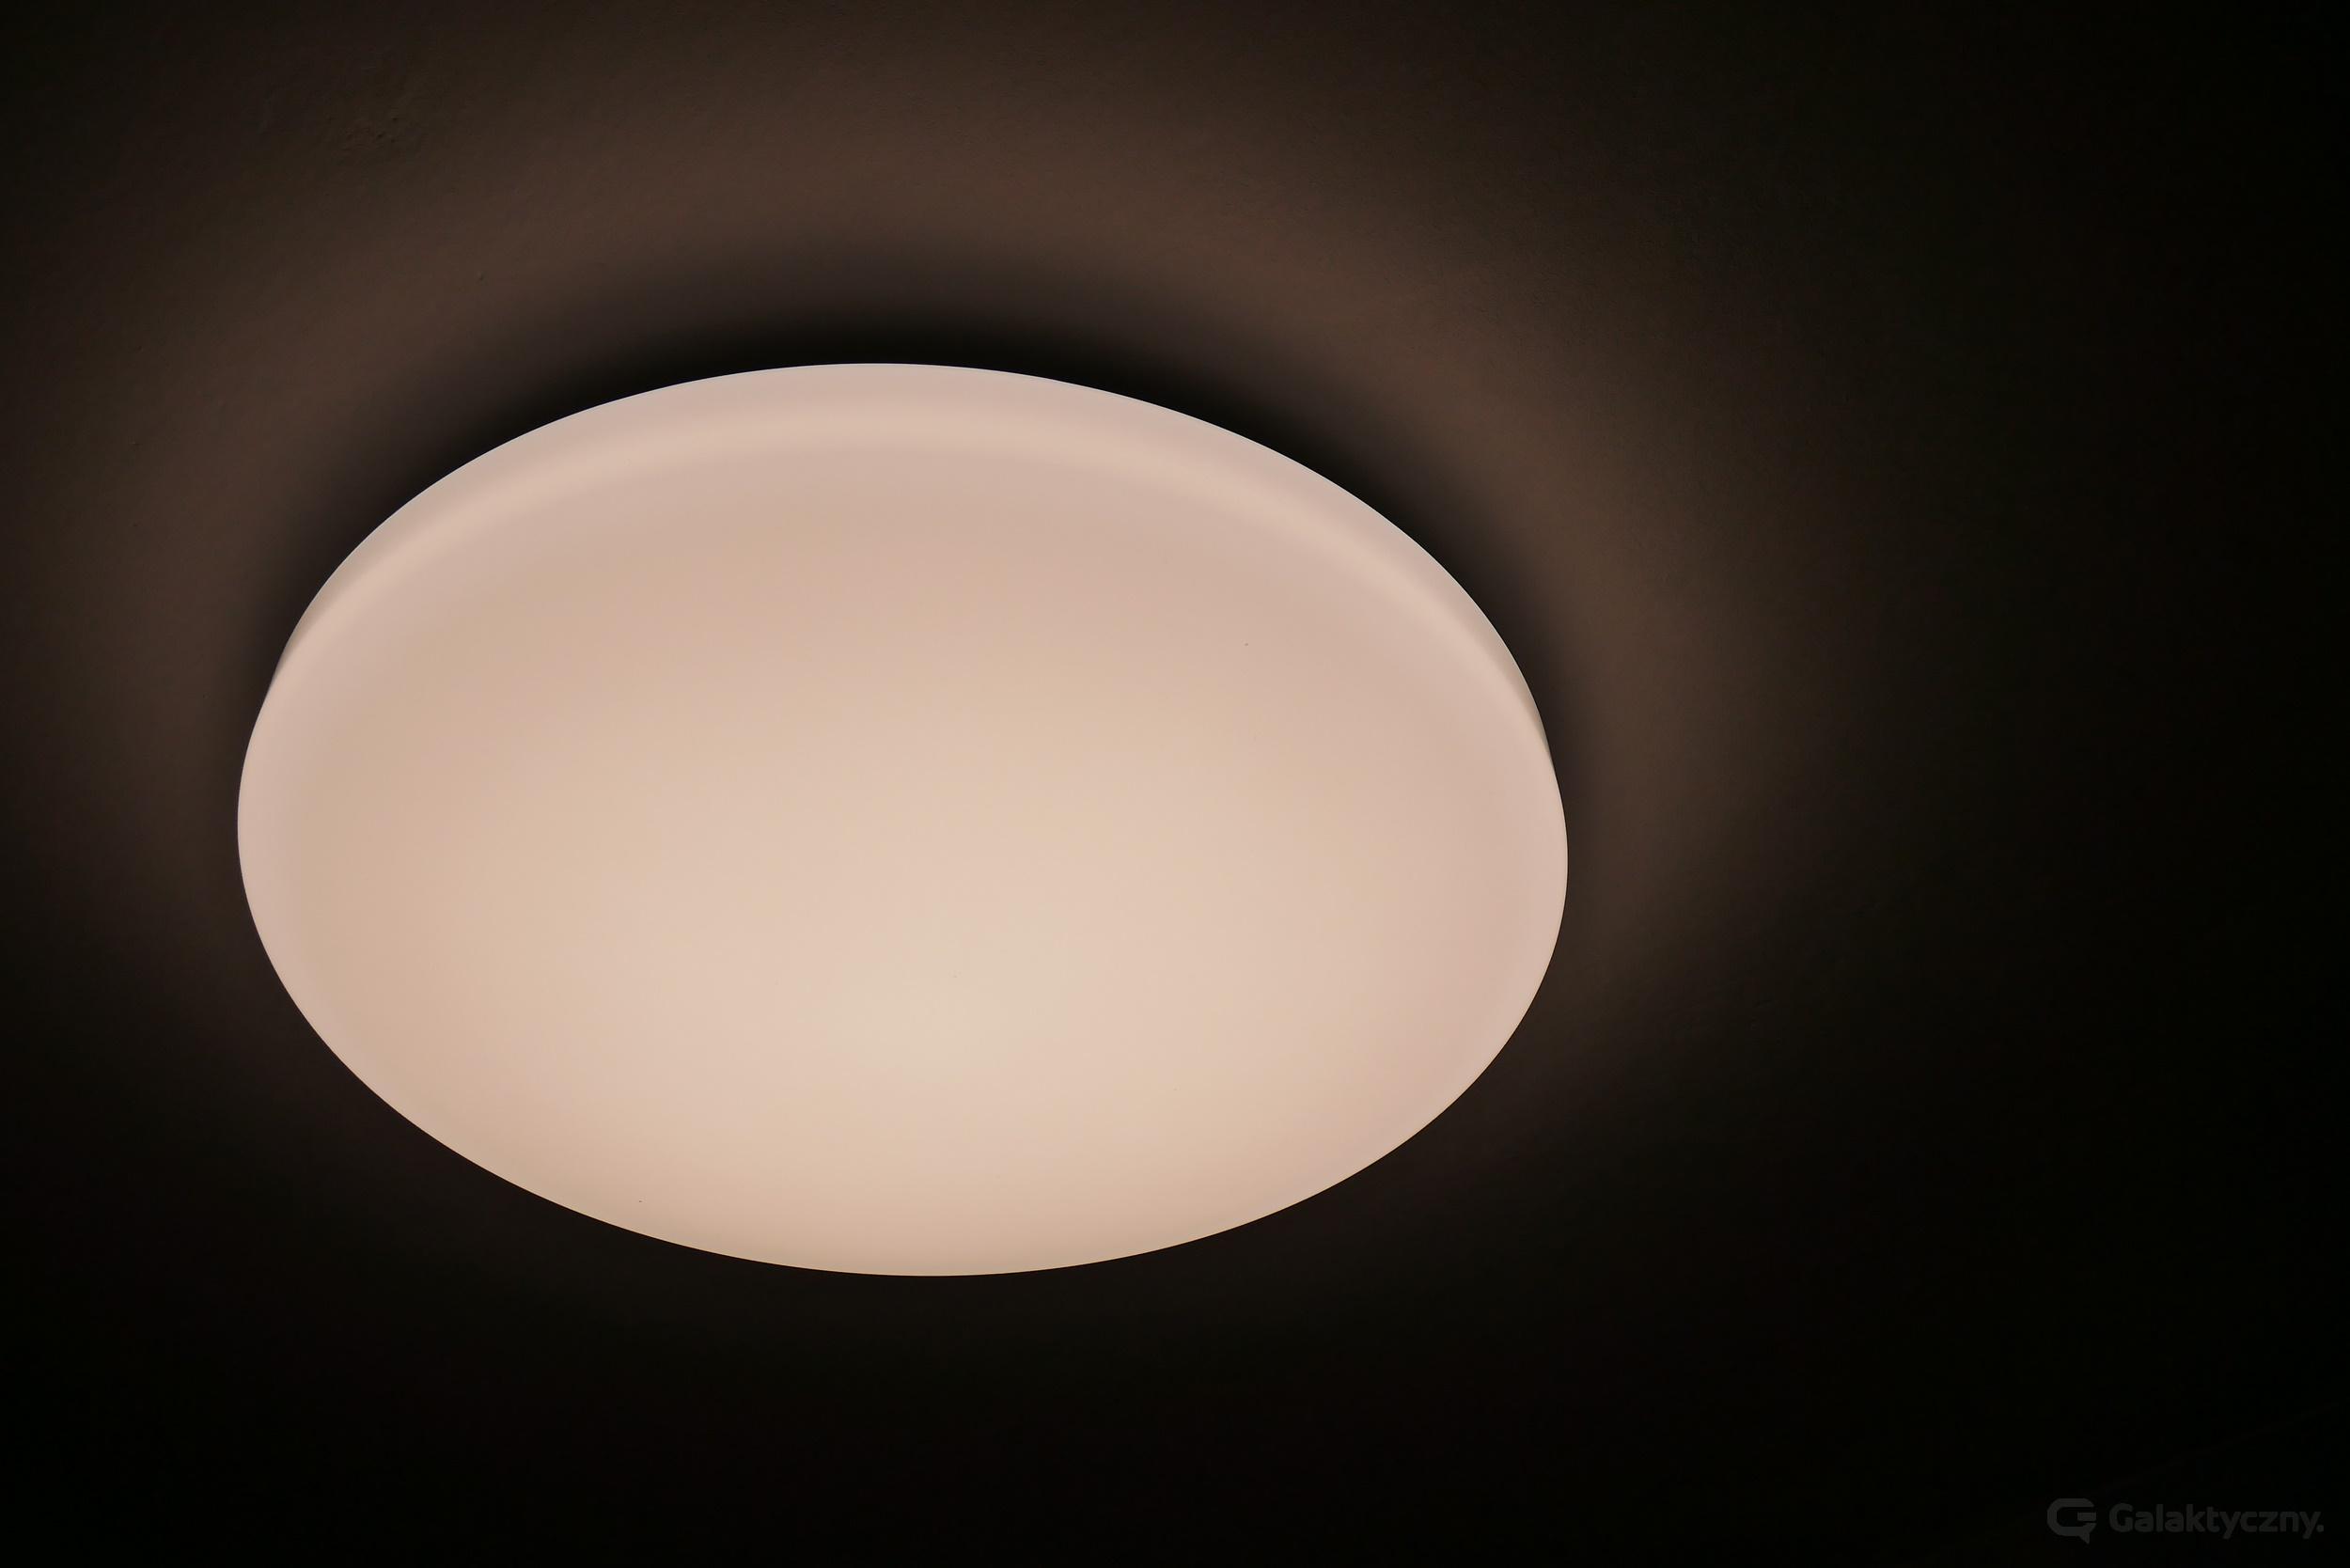 Yeelight Ceiling Lamp